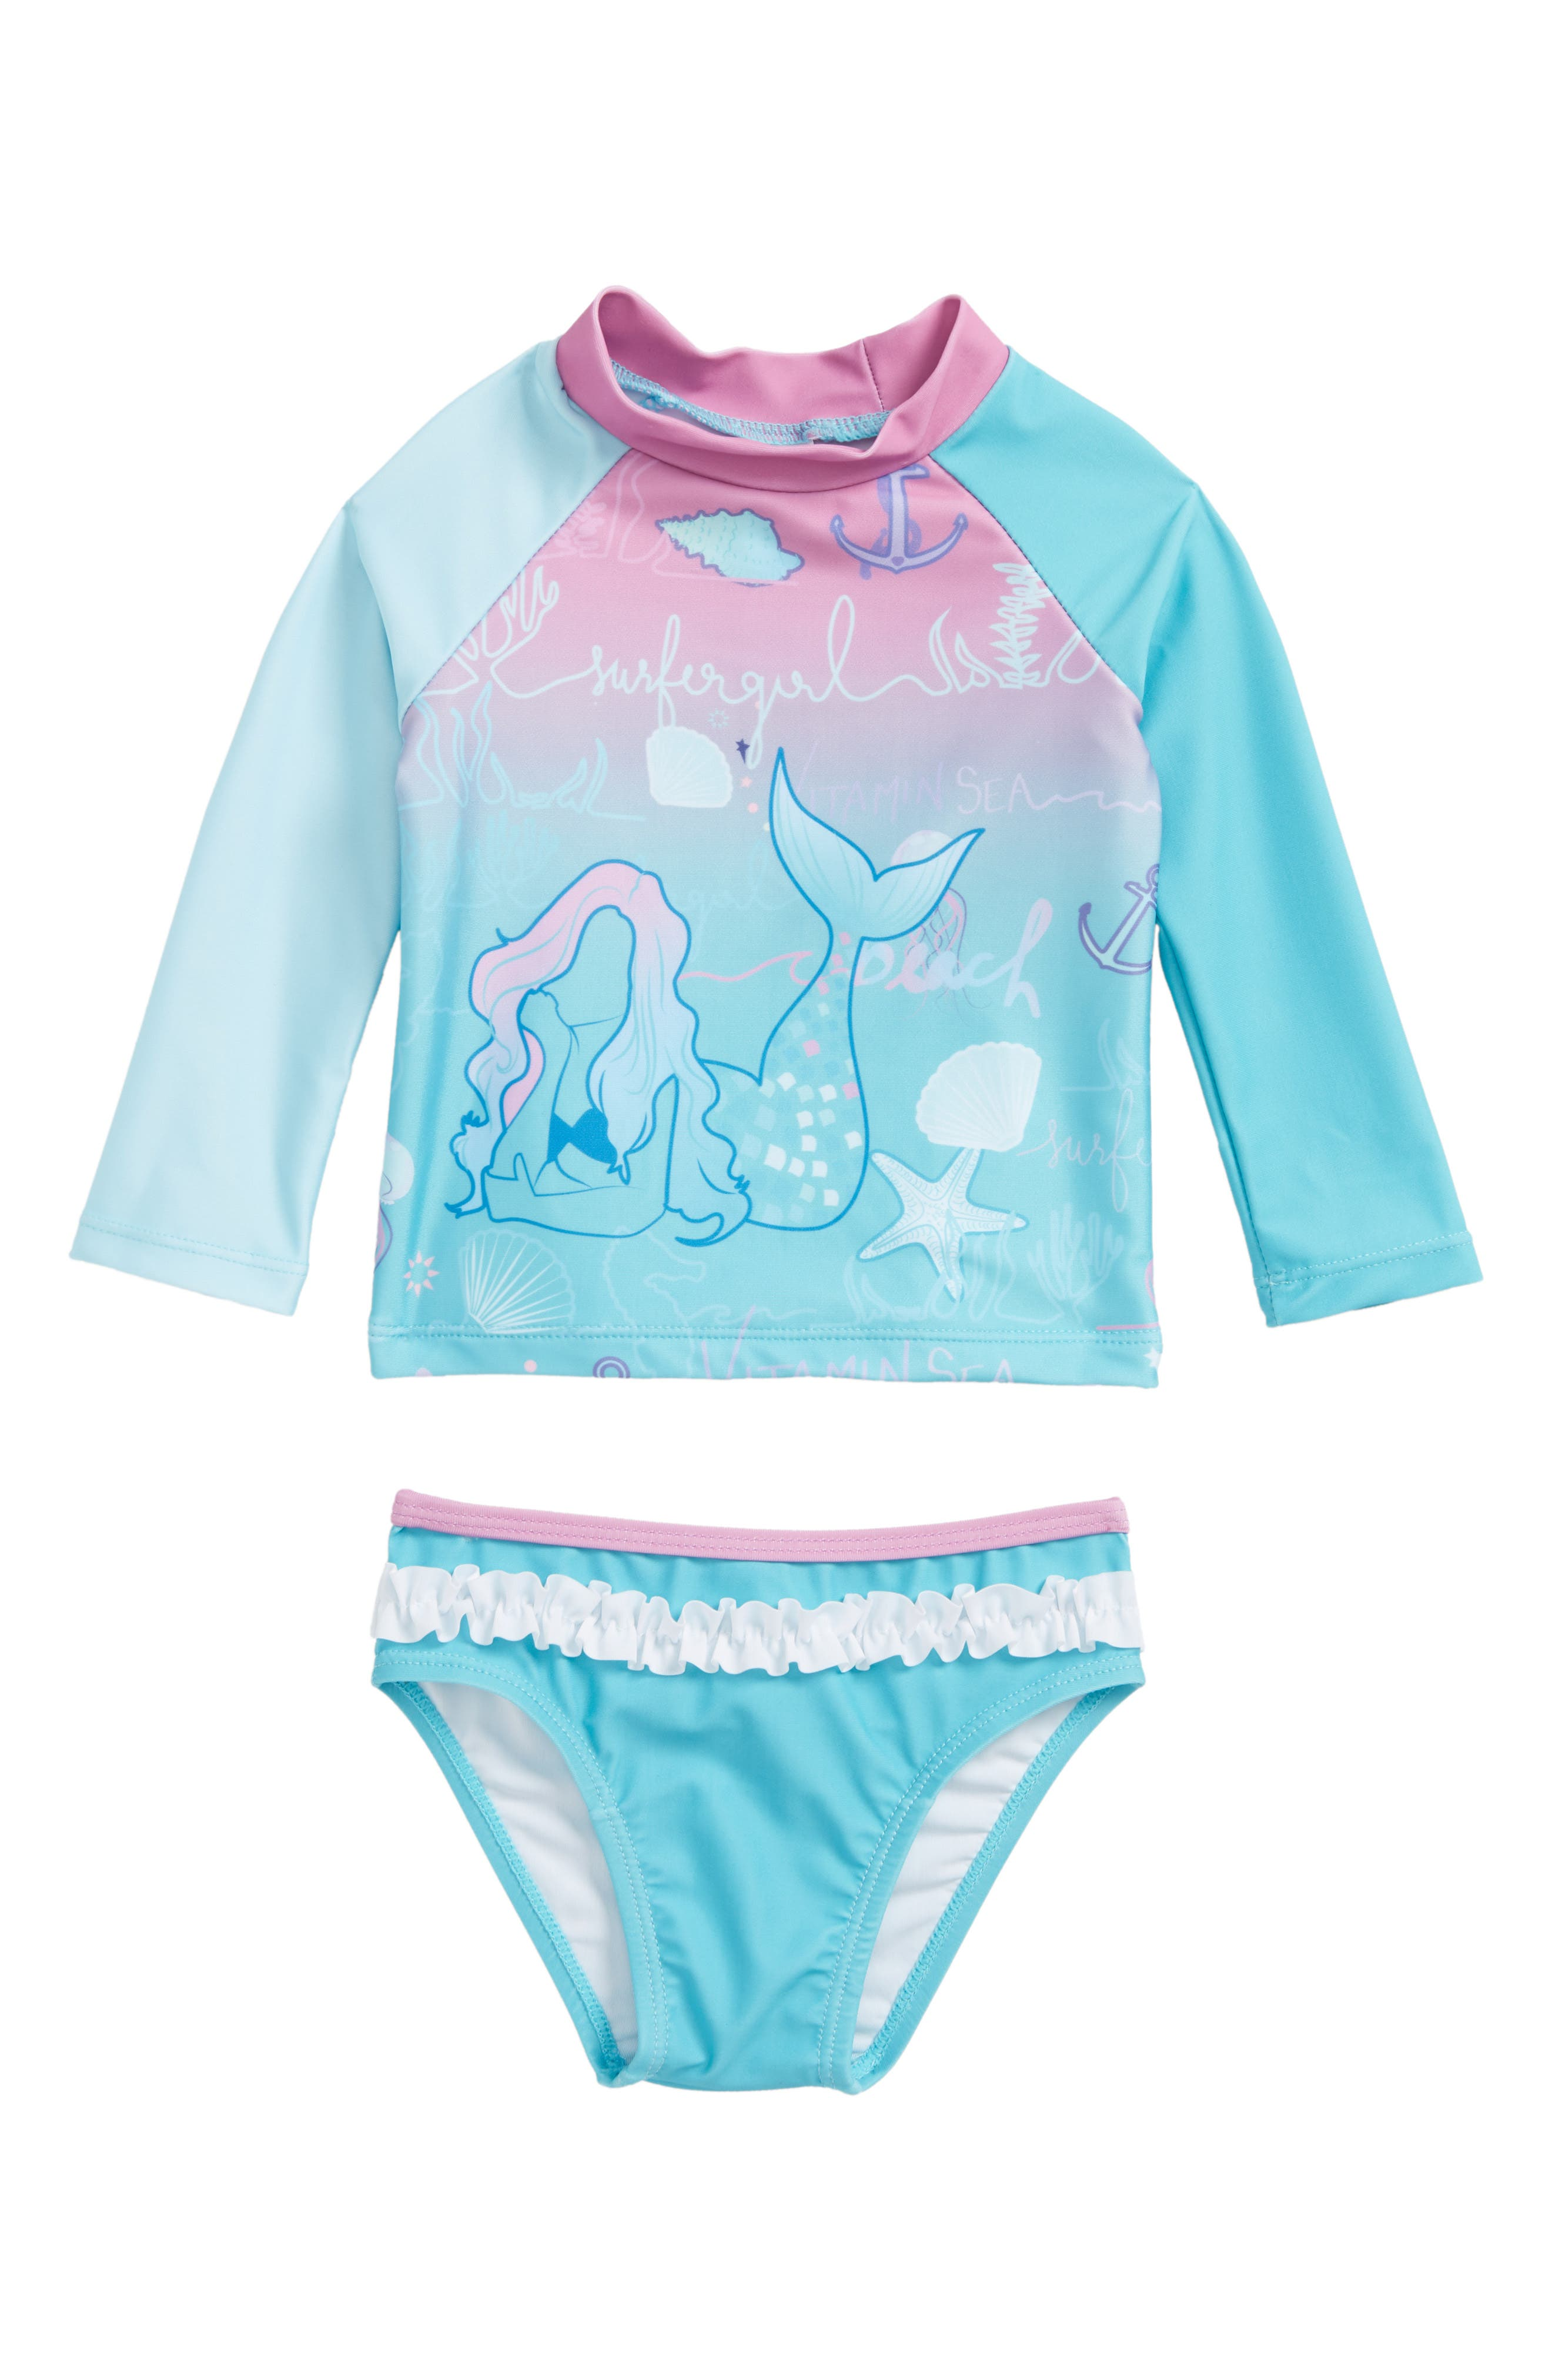 Two-Piece Rashguard Swimsuit,                             Main thumbnail 1, color,                             440